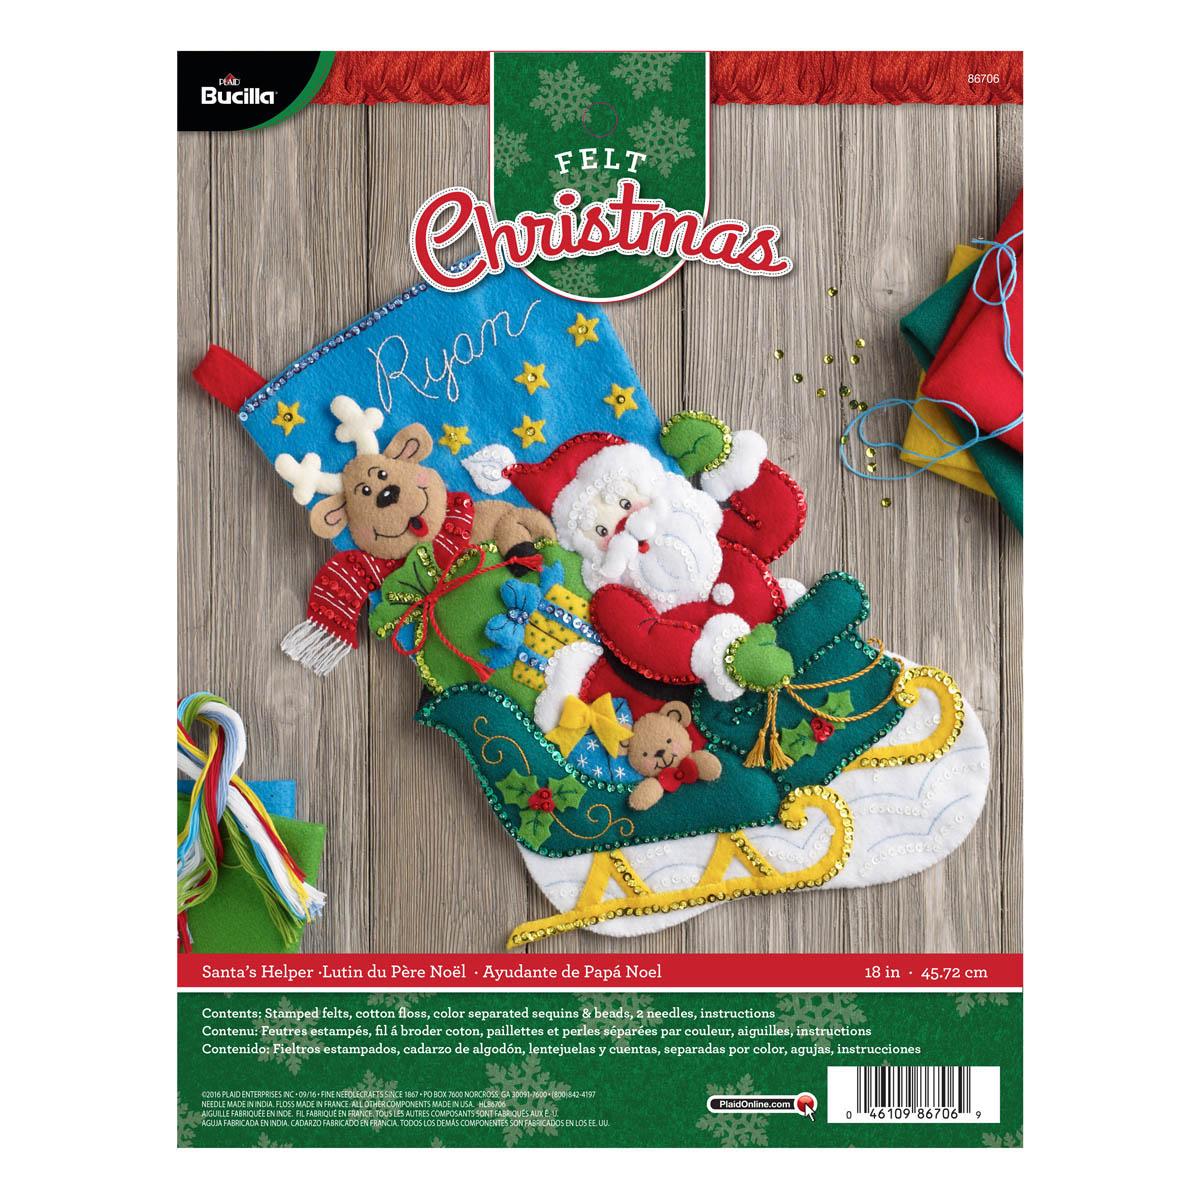 Bucilla ® Seasonal - Felt - Stocking Kits - Santa's Helper